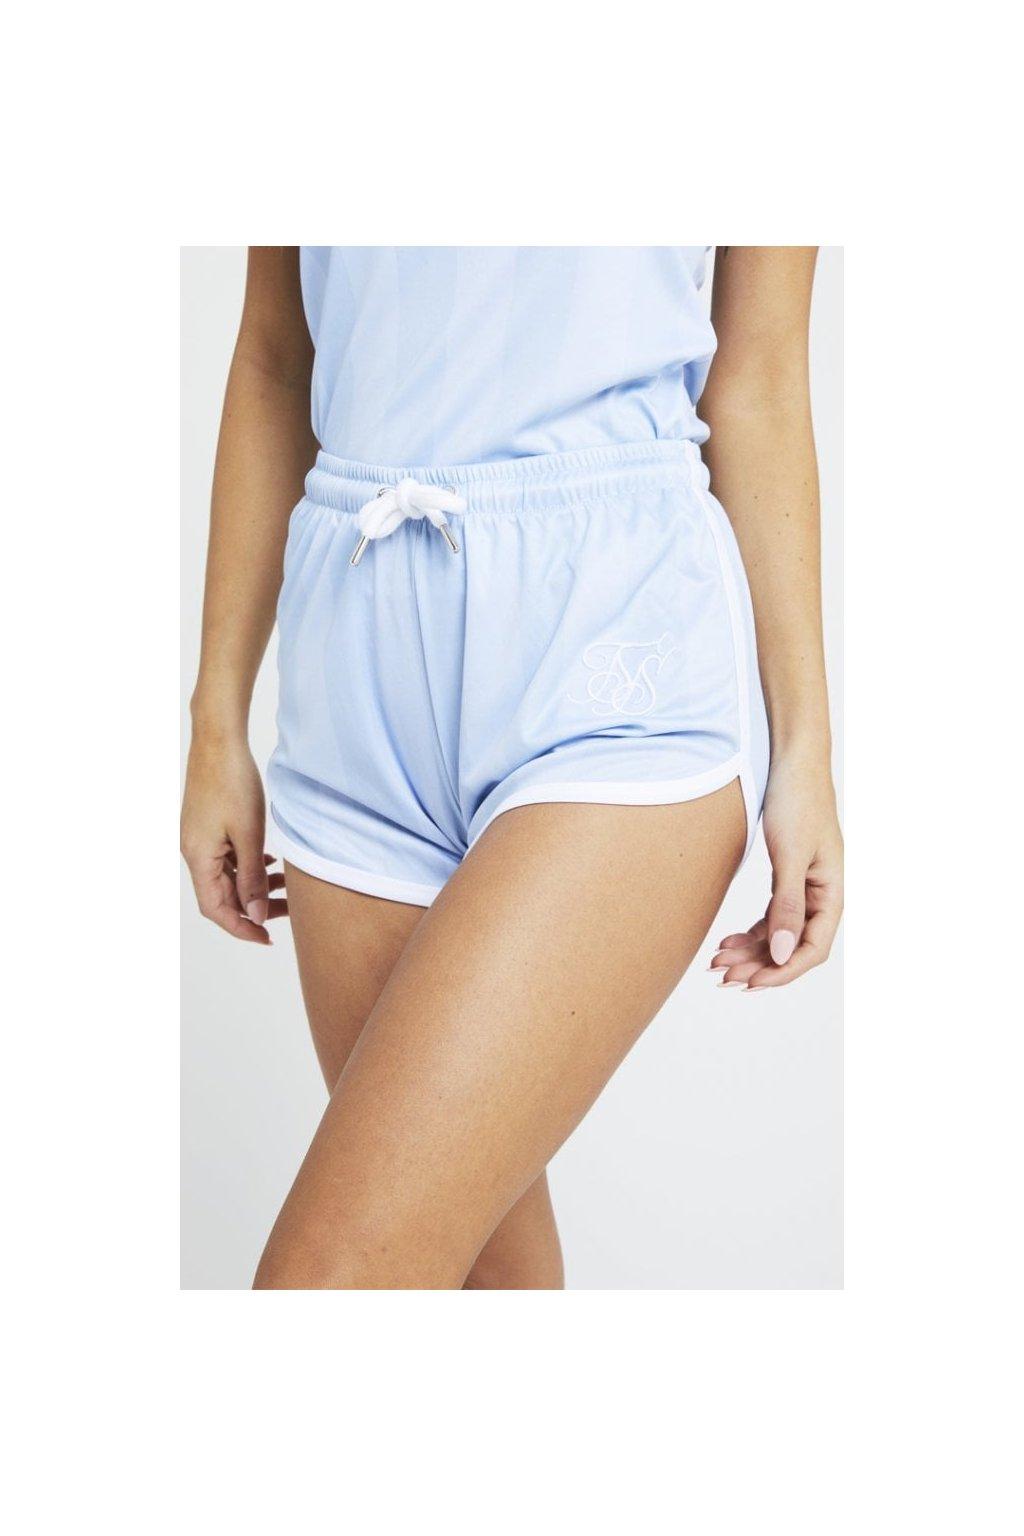 siksilk shadow stripe shorts light blue p2920 25016 medium